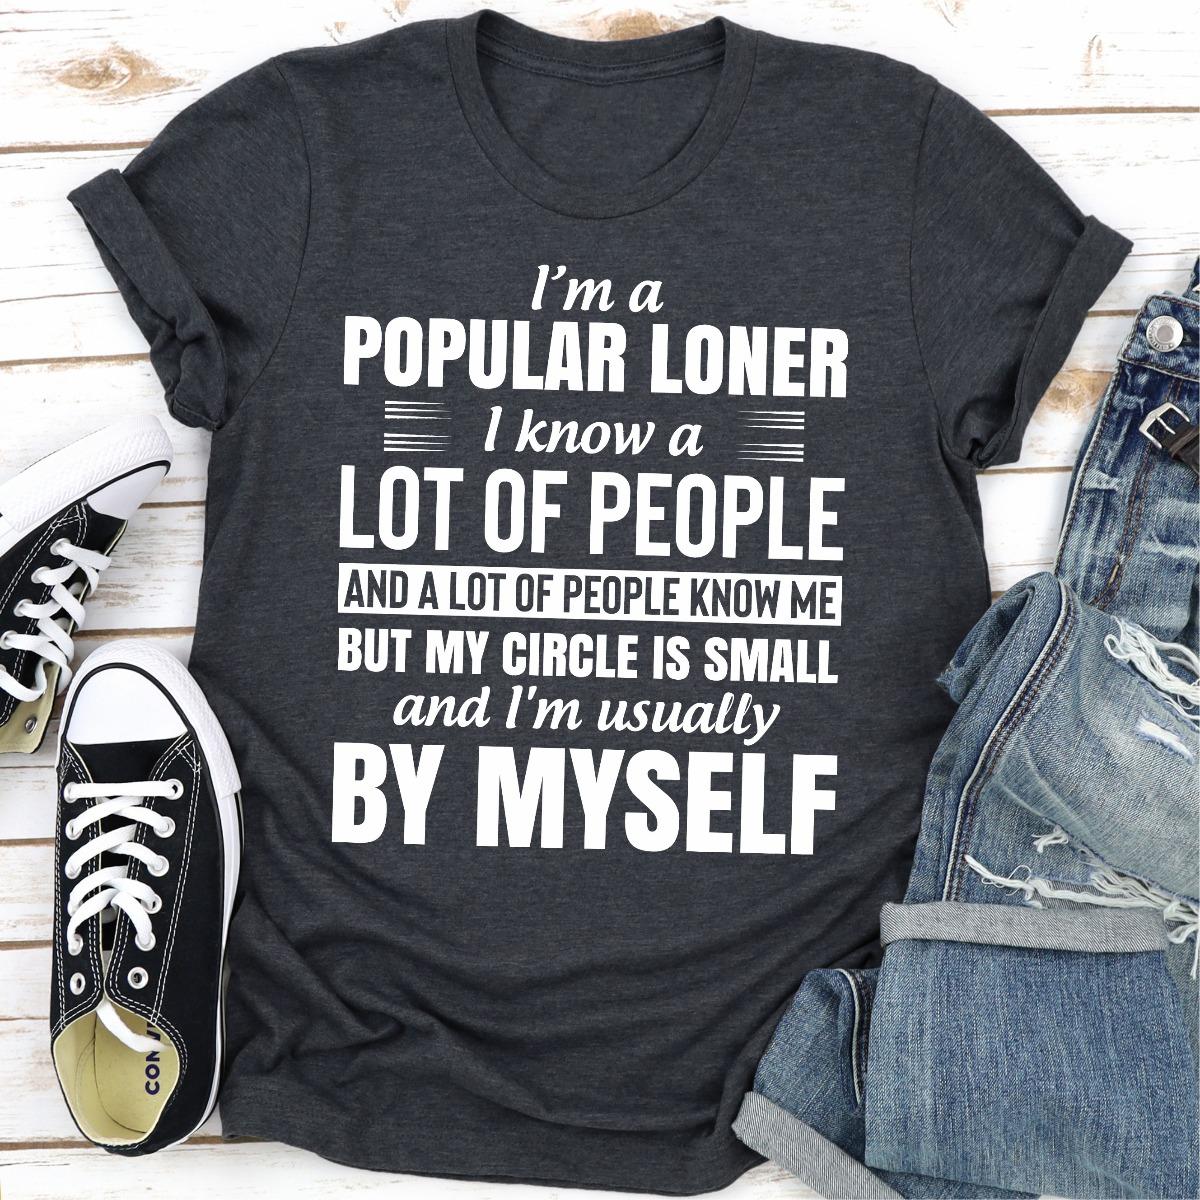 I'm A Popular Loner (Dark Heather / S)